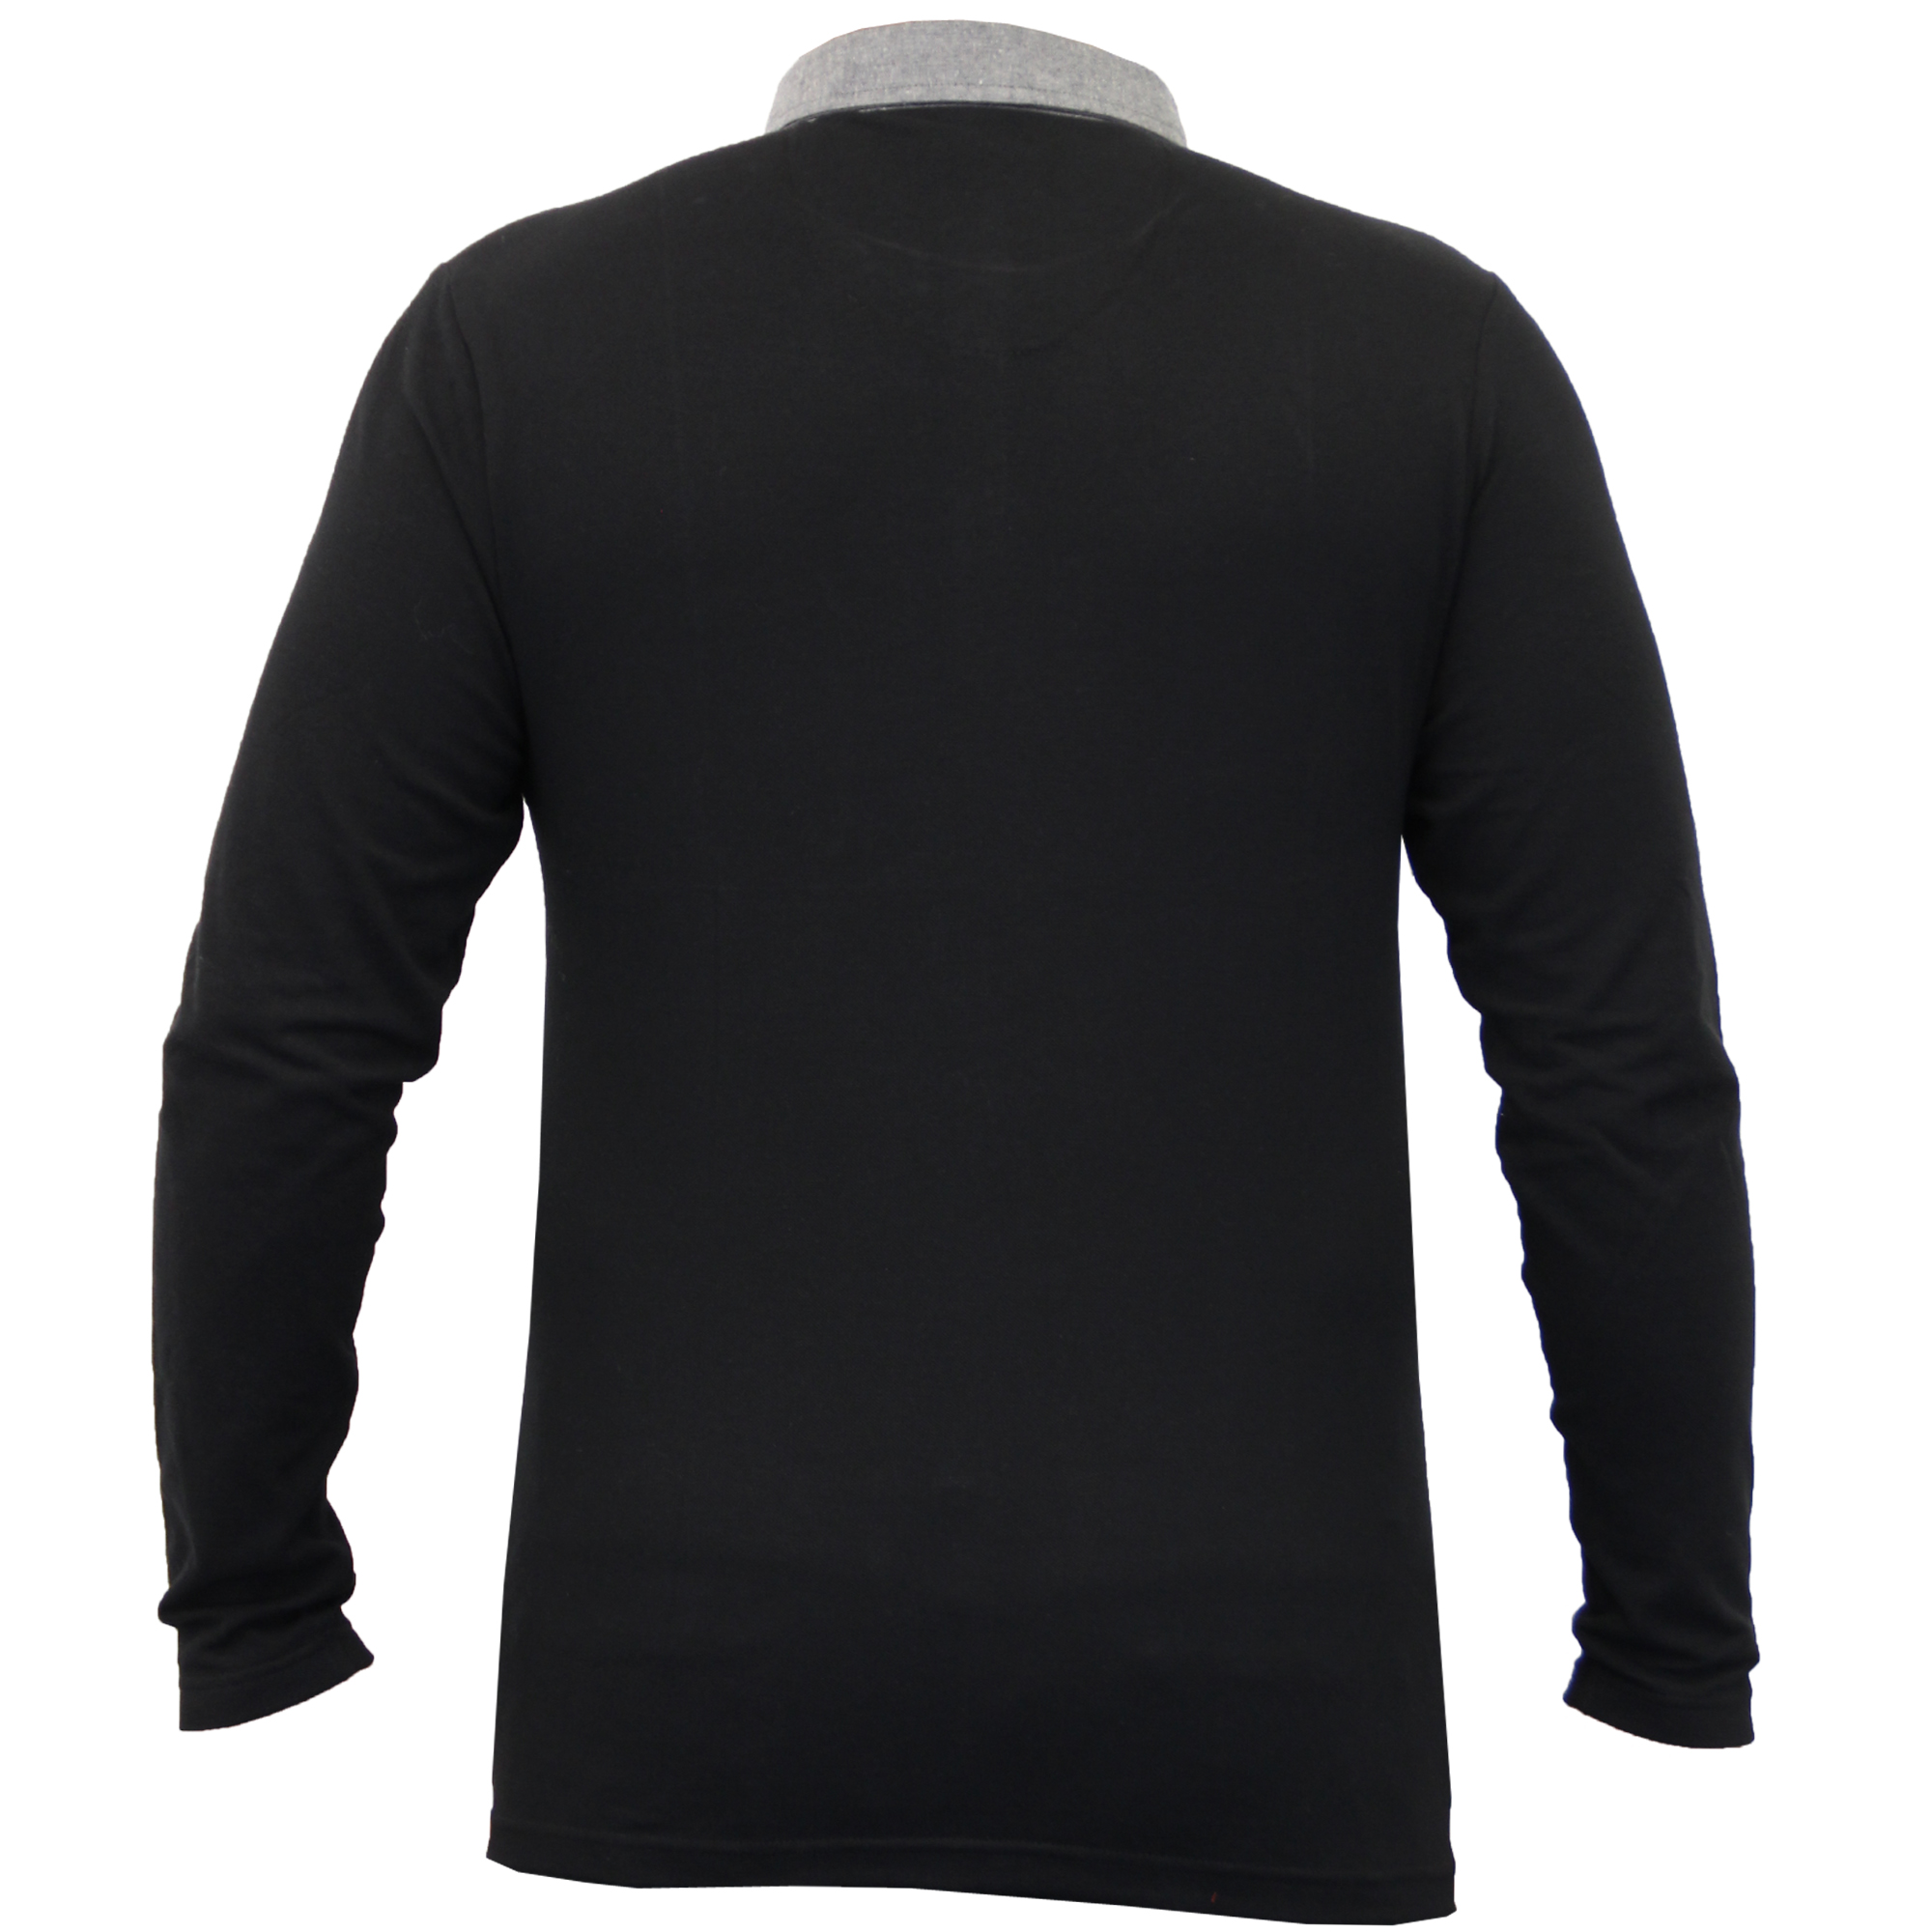 Homme-a-Manches-Longues-Jersey-Top-Brave-Soul-Pique-Polo-T-Shirt-A-Col-Ete-Neuf miniature 3